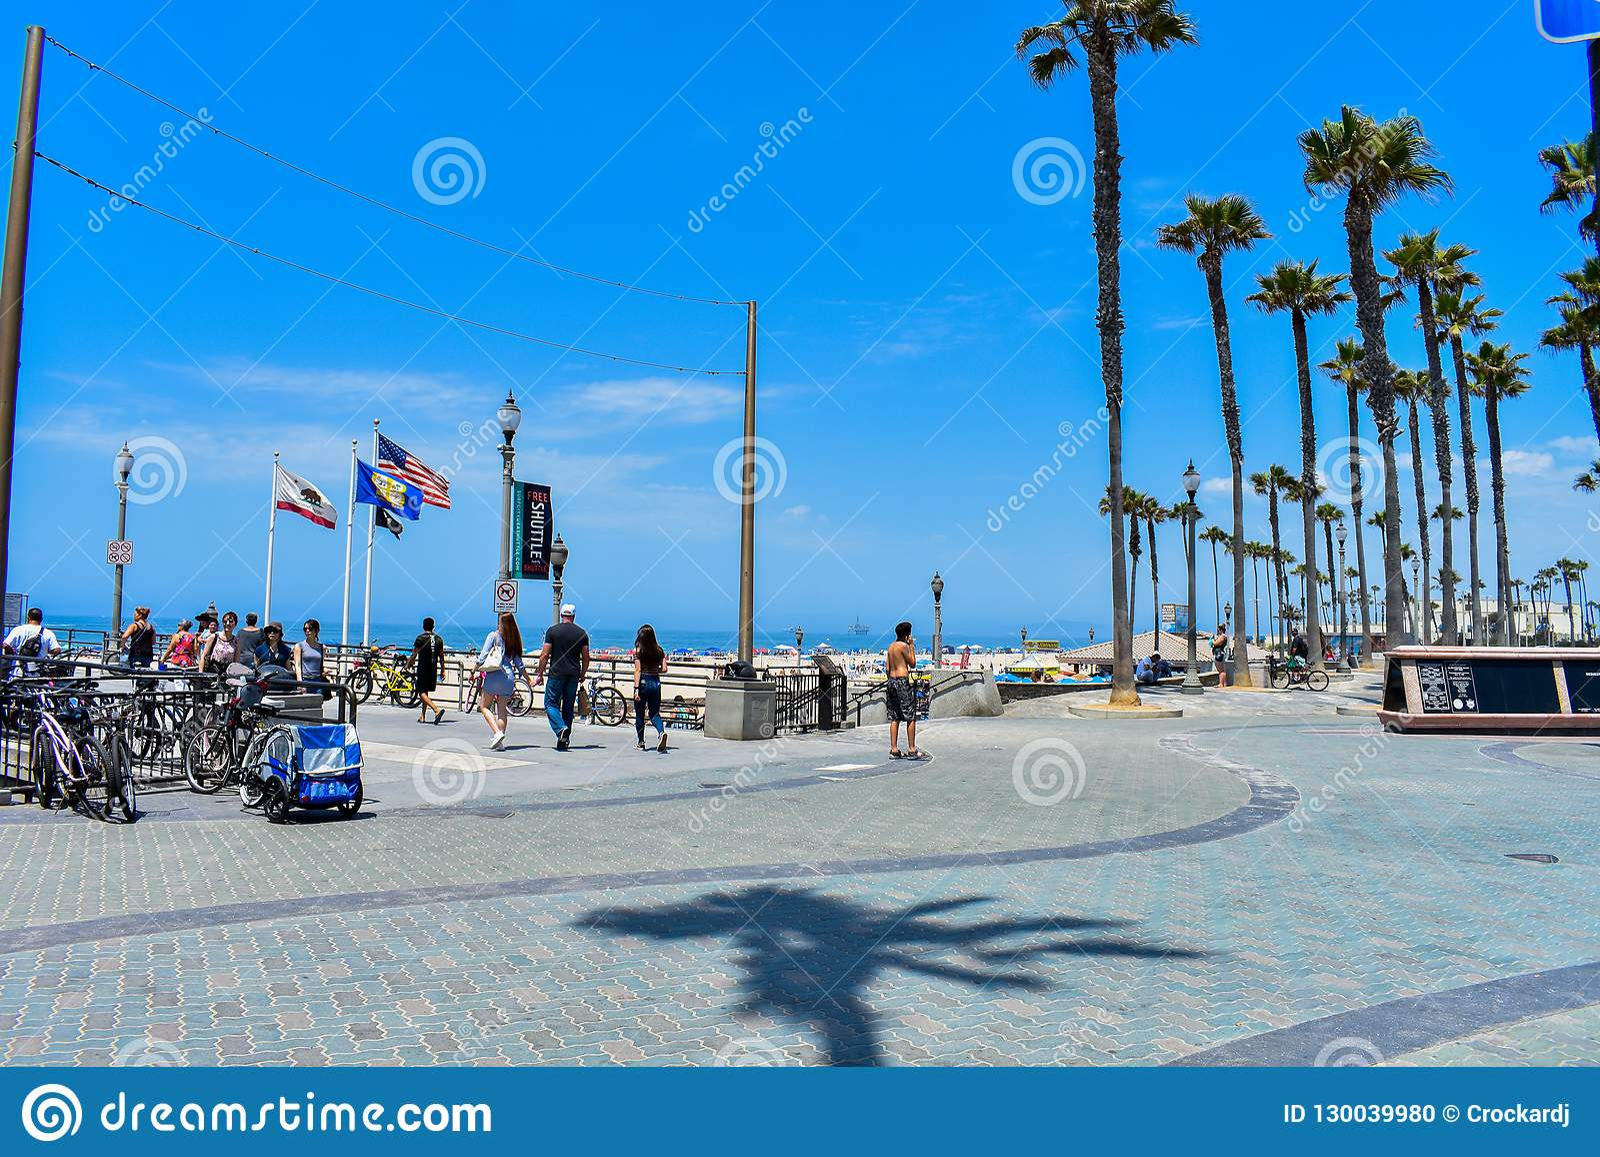 7-8-18 Huntington Beach, Ca un jour ensoleillé